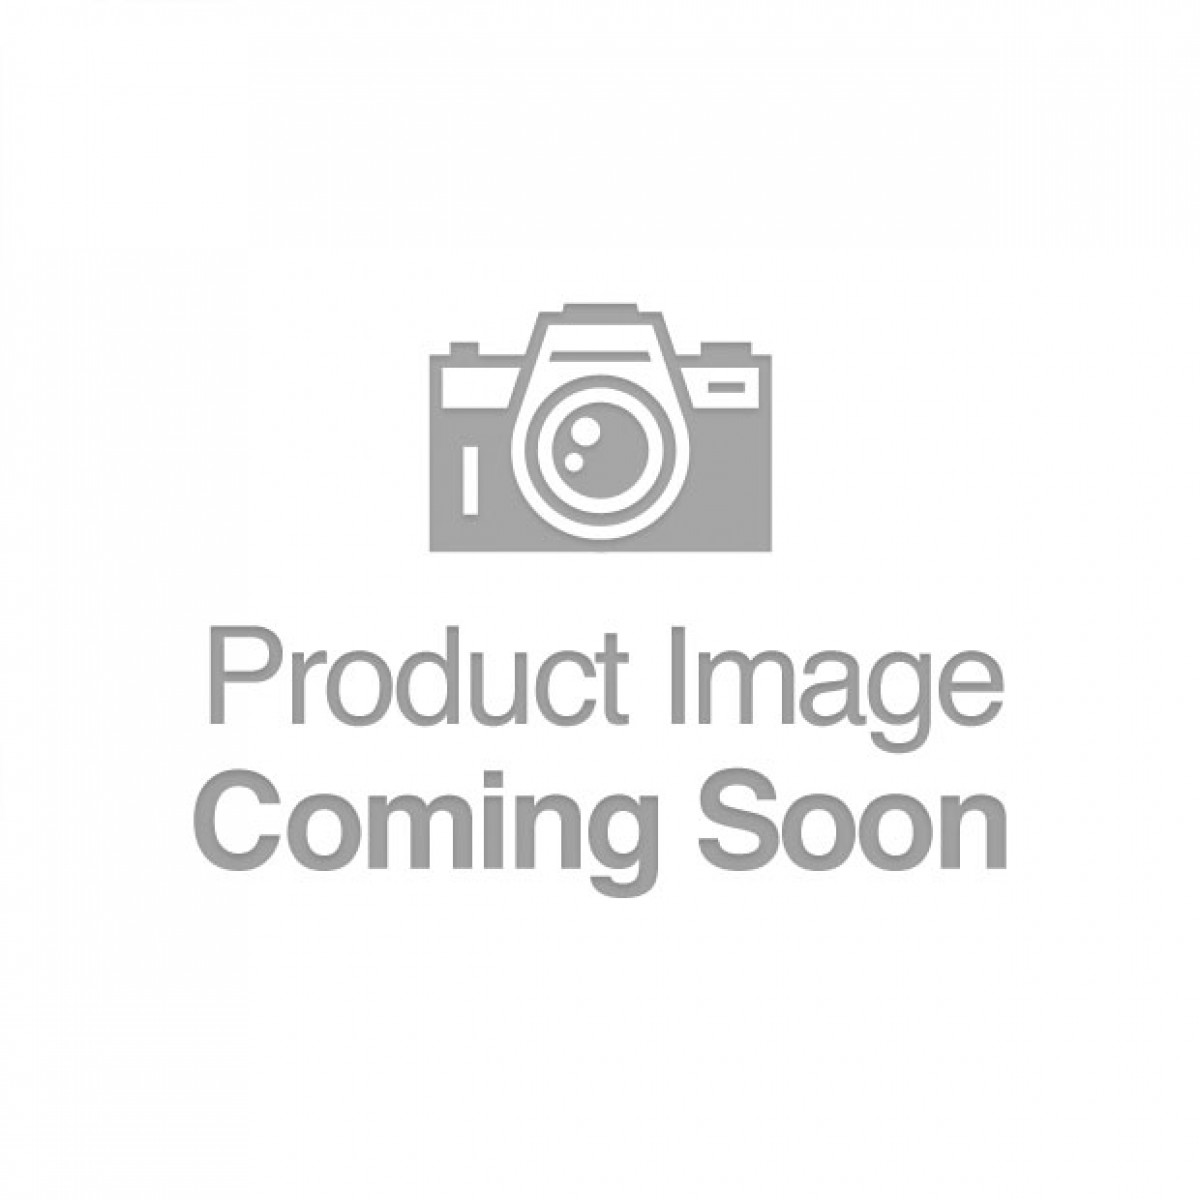 "Shots RealRock 7.5"" Silicone Dual Density Dildo - Brown"